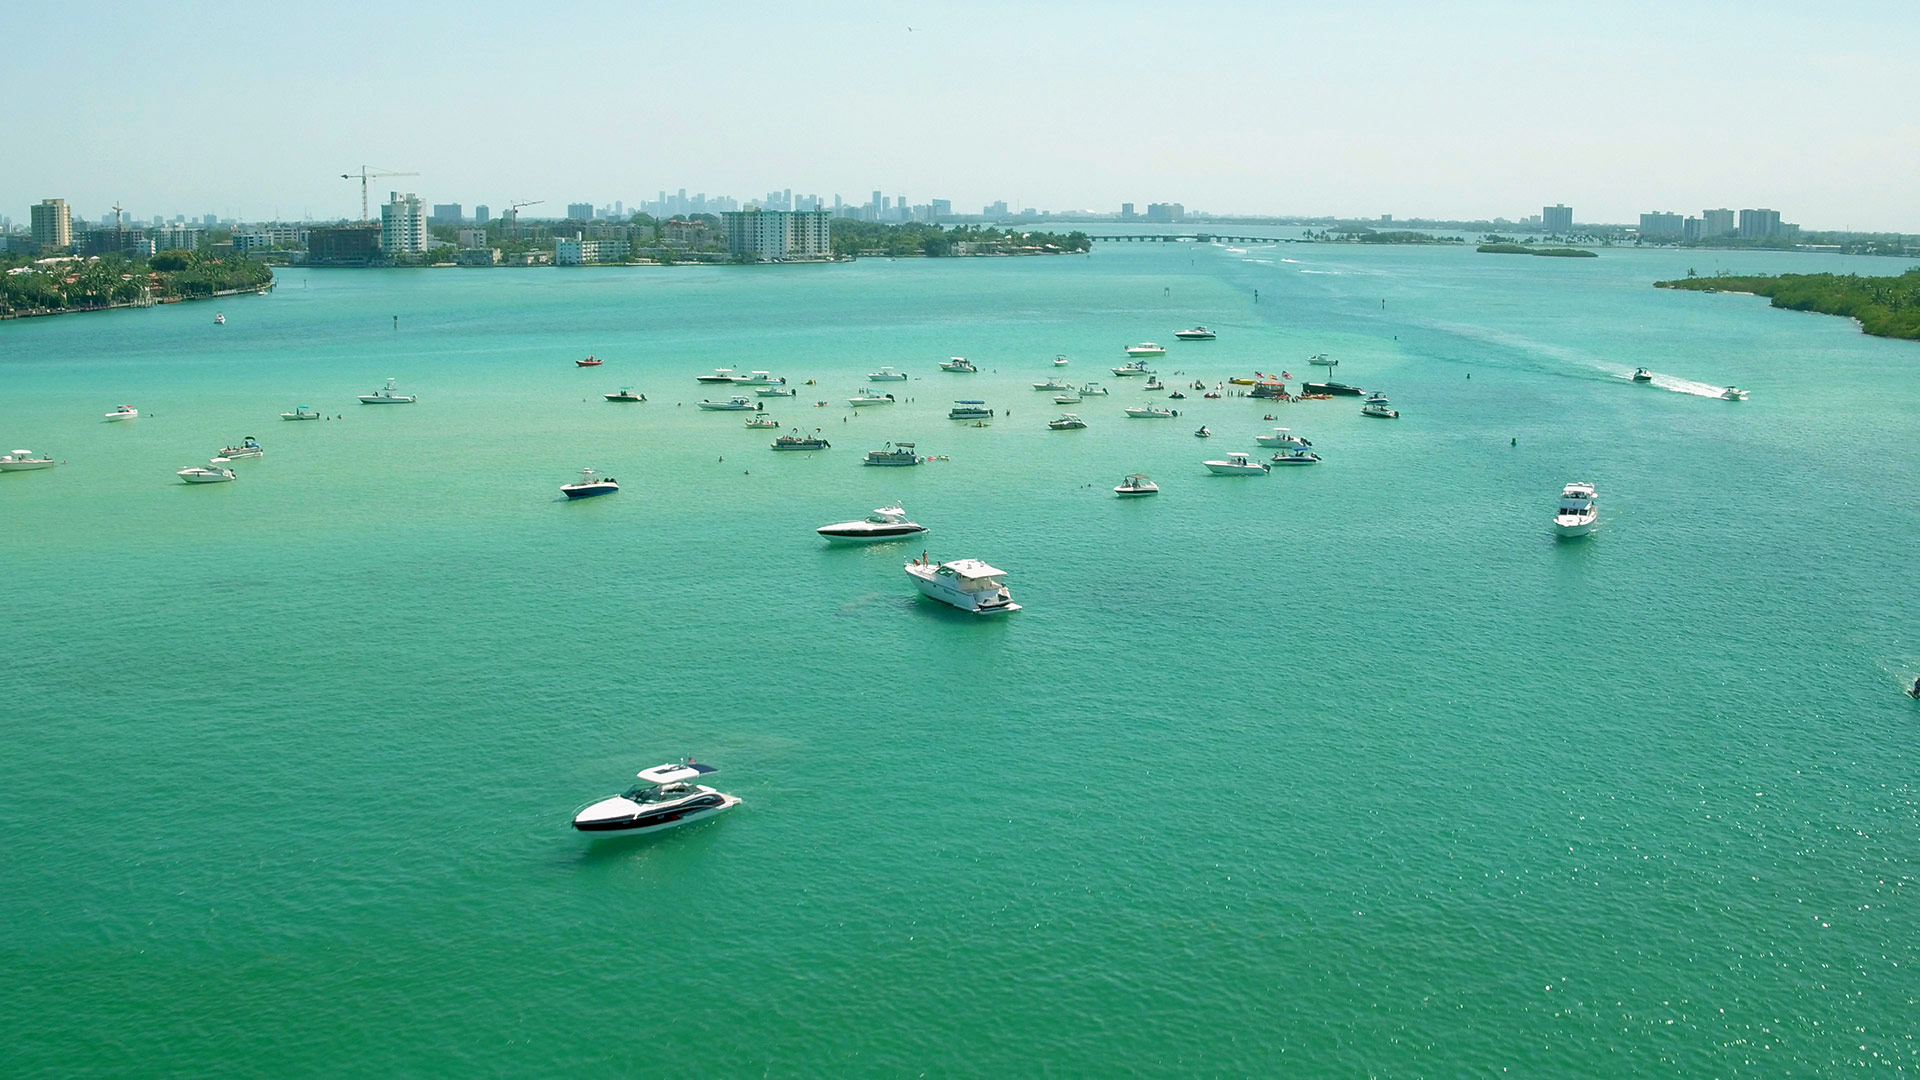 Boat Rentals Charter Boat Rentals House Boat Rentals On Boatsetter